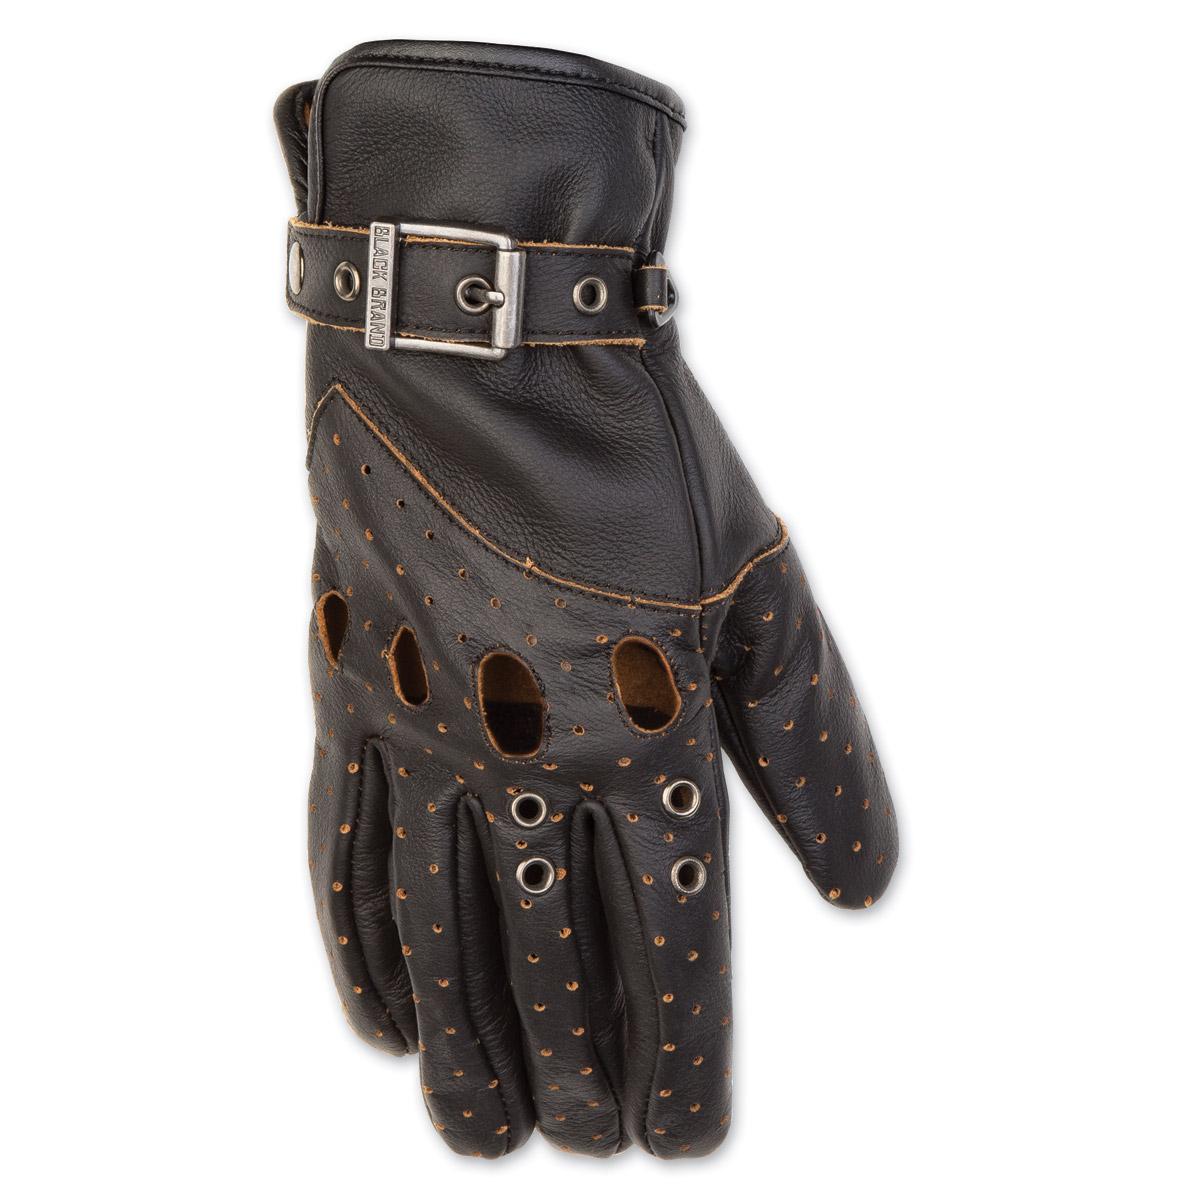 Womens leather motorcycle riding gloves - Black Brand Women S Vintage Venom Black Leather Gloves